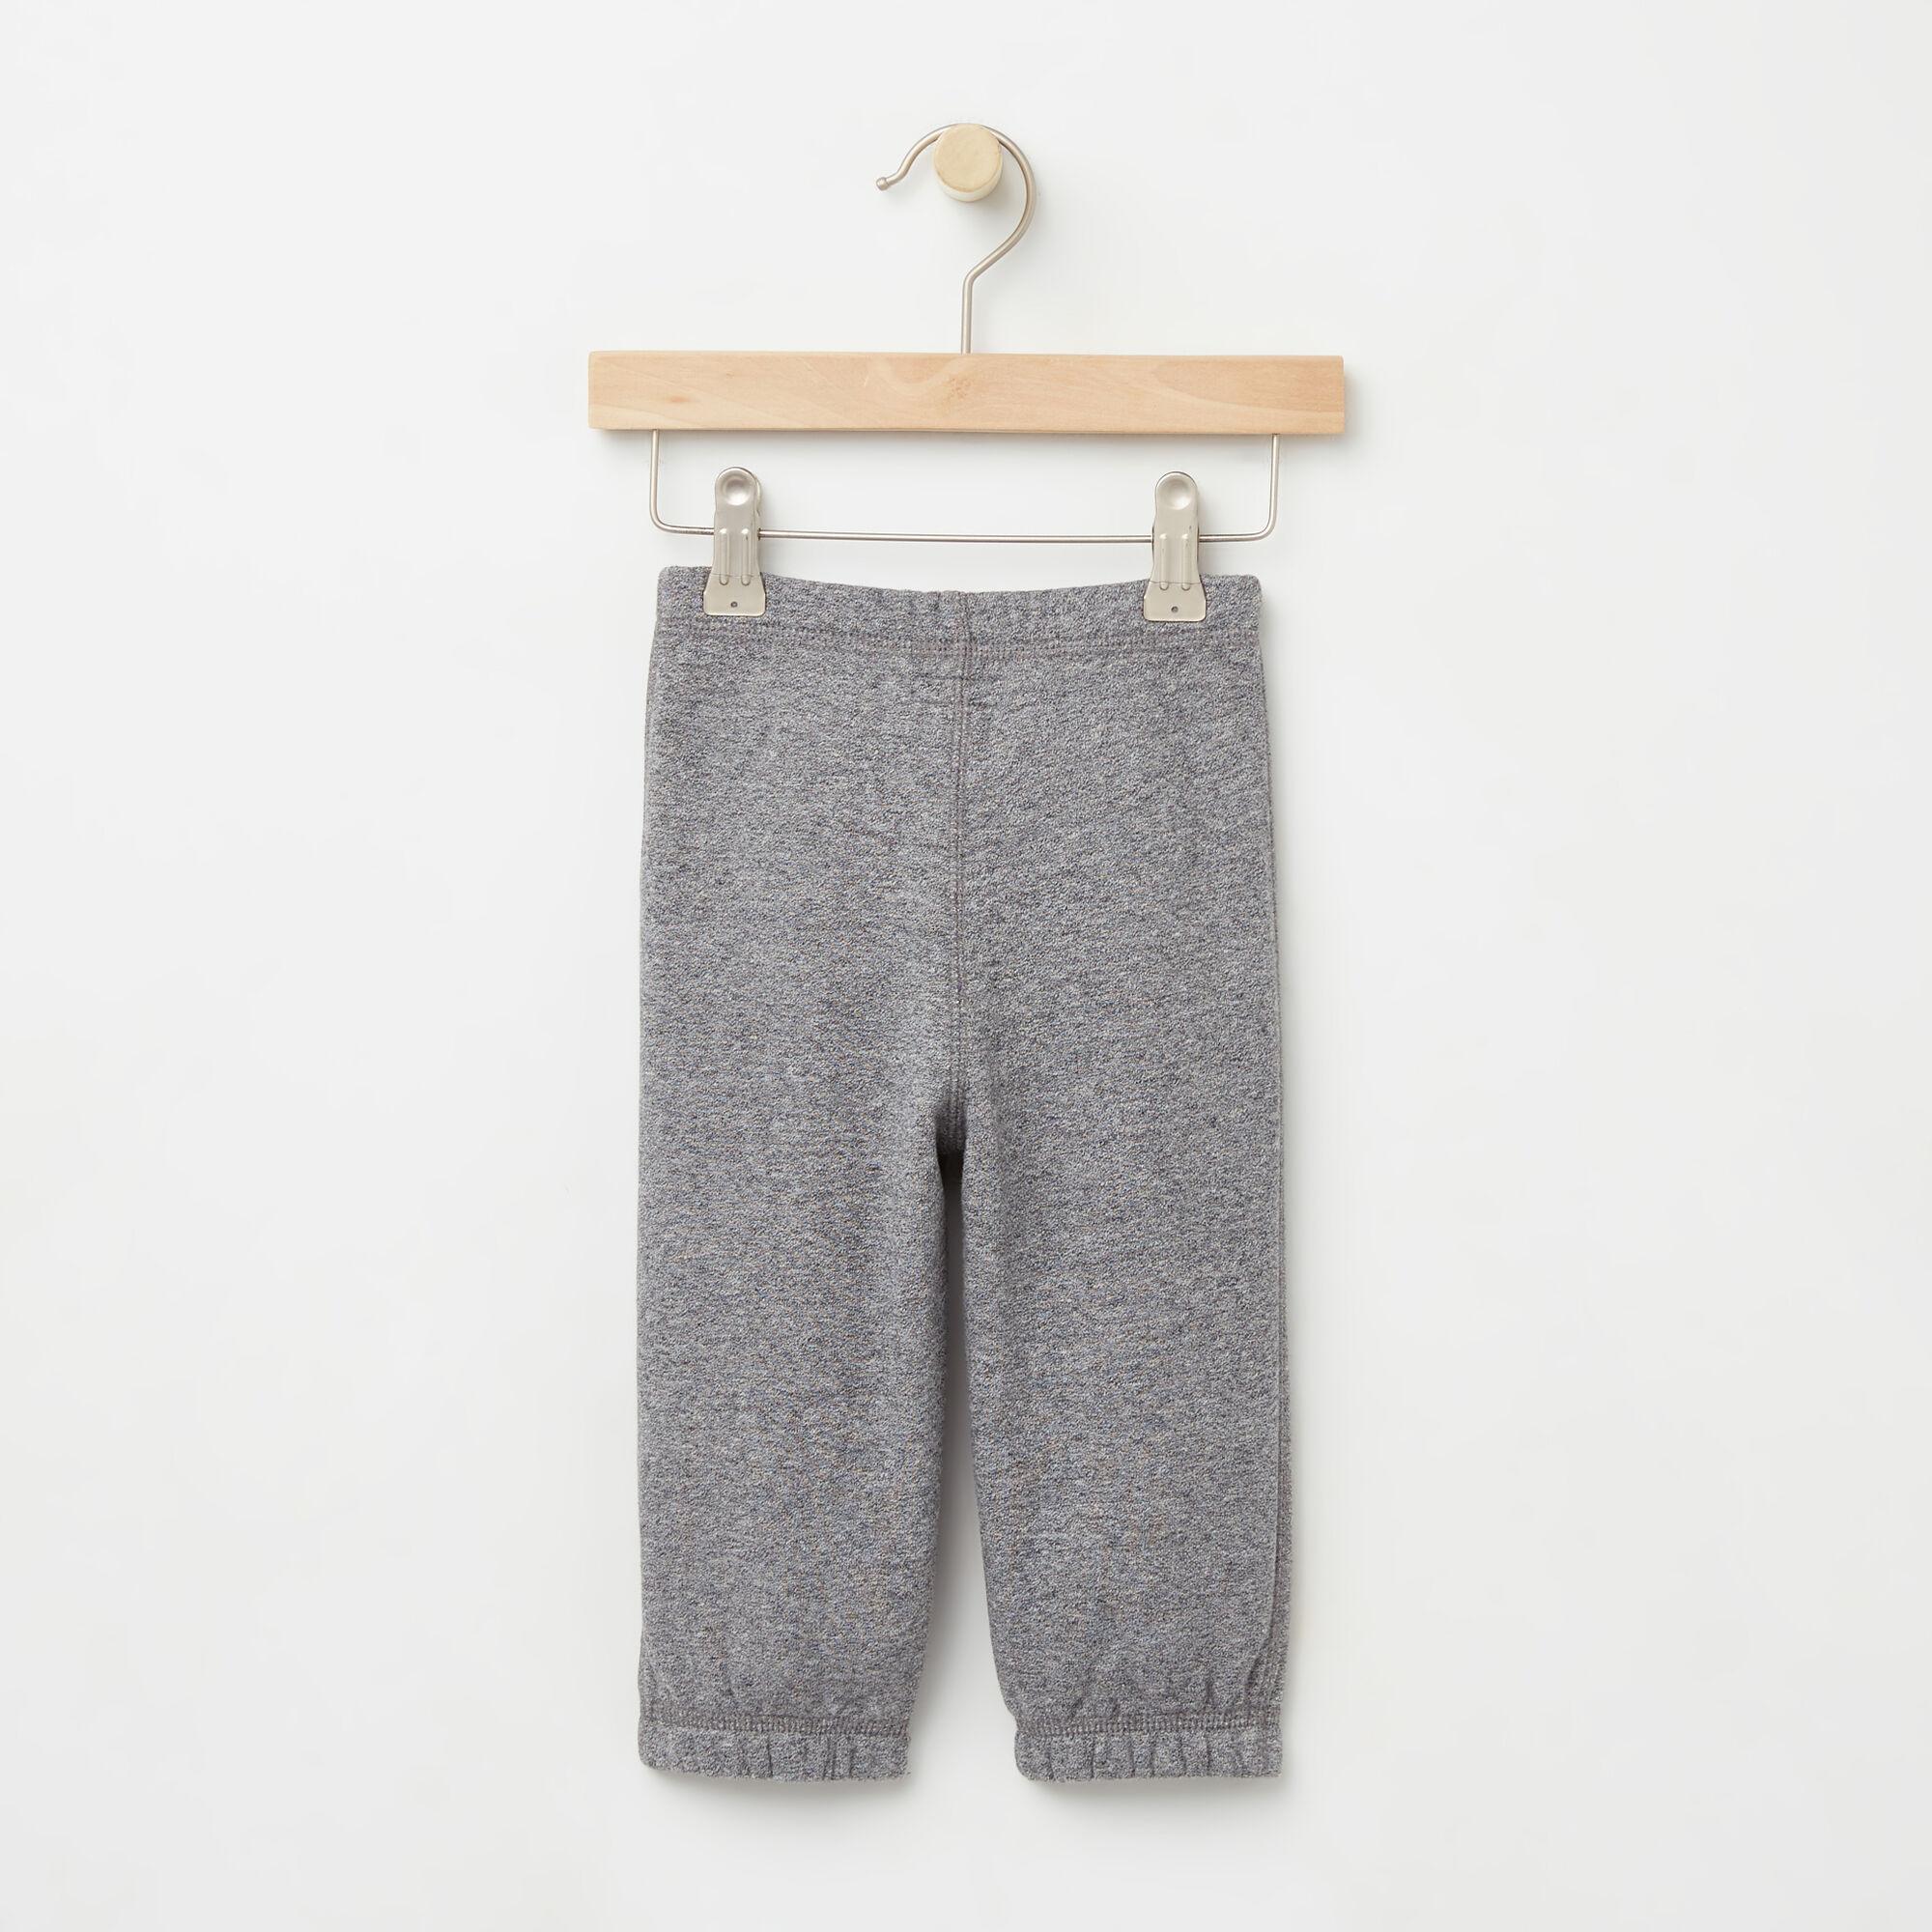 Bébés Pantalon Coton Ouaté Original